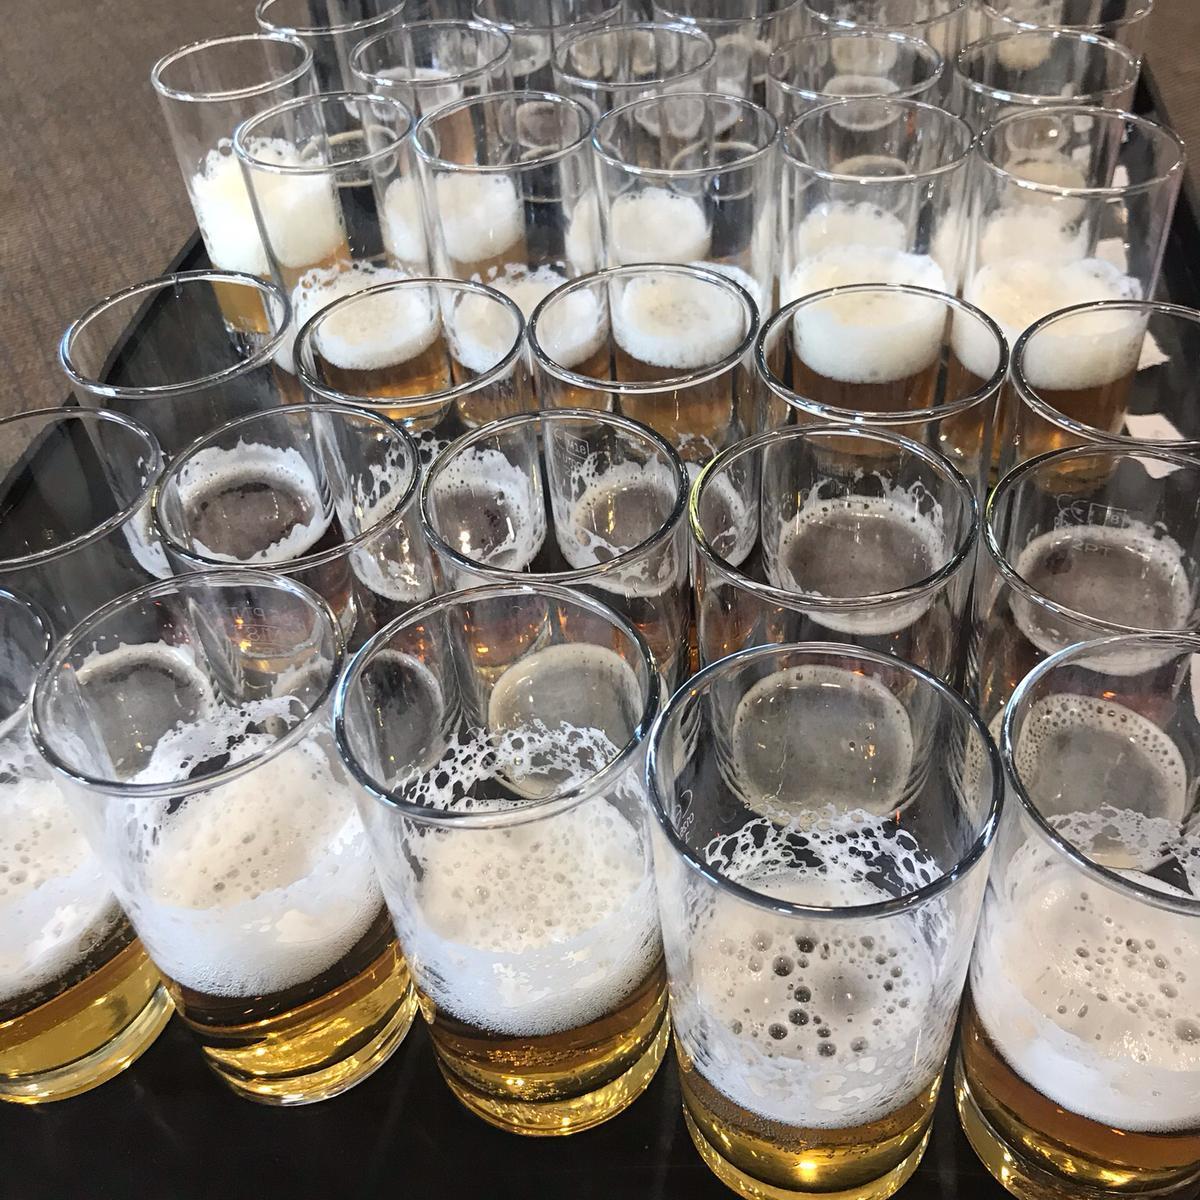 Taste Awards 2019 beer judging